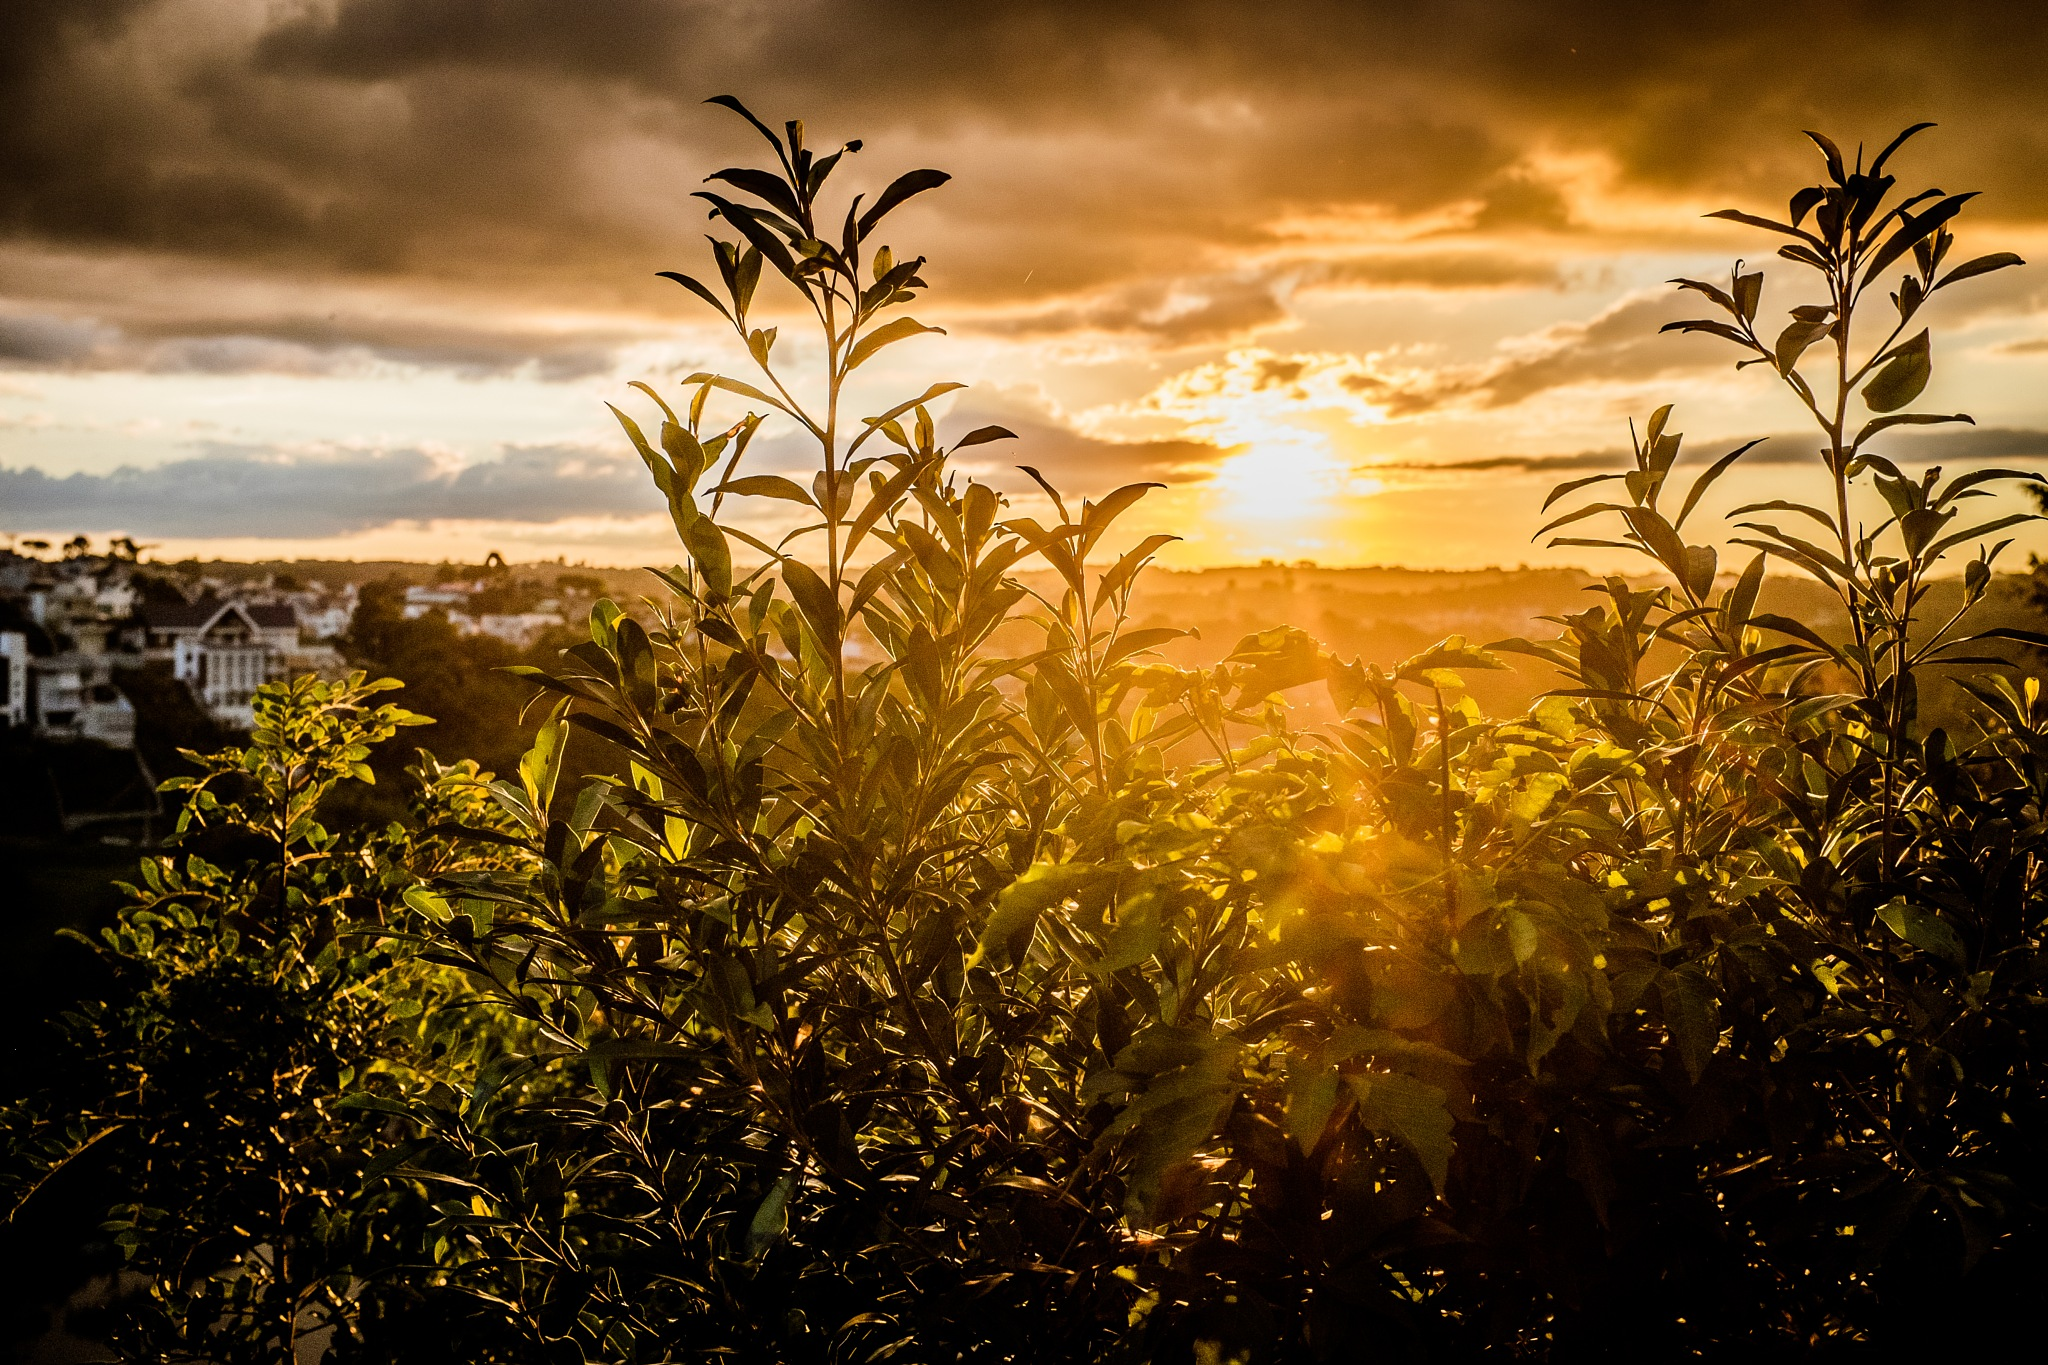 Sunset by stelhenrique